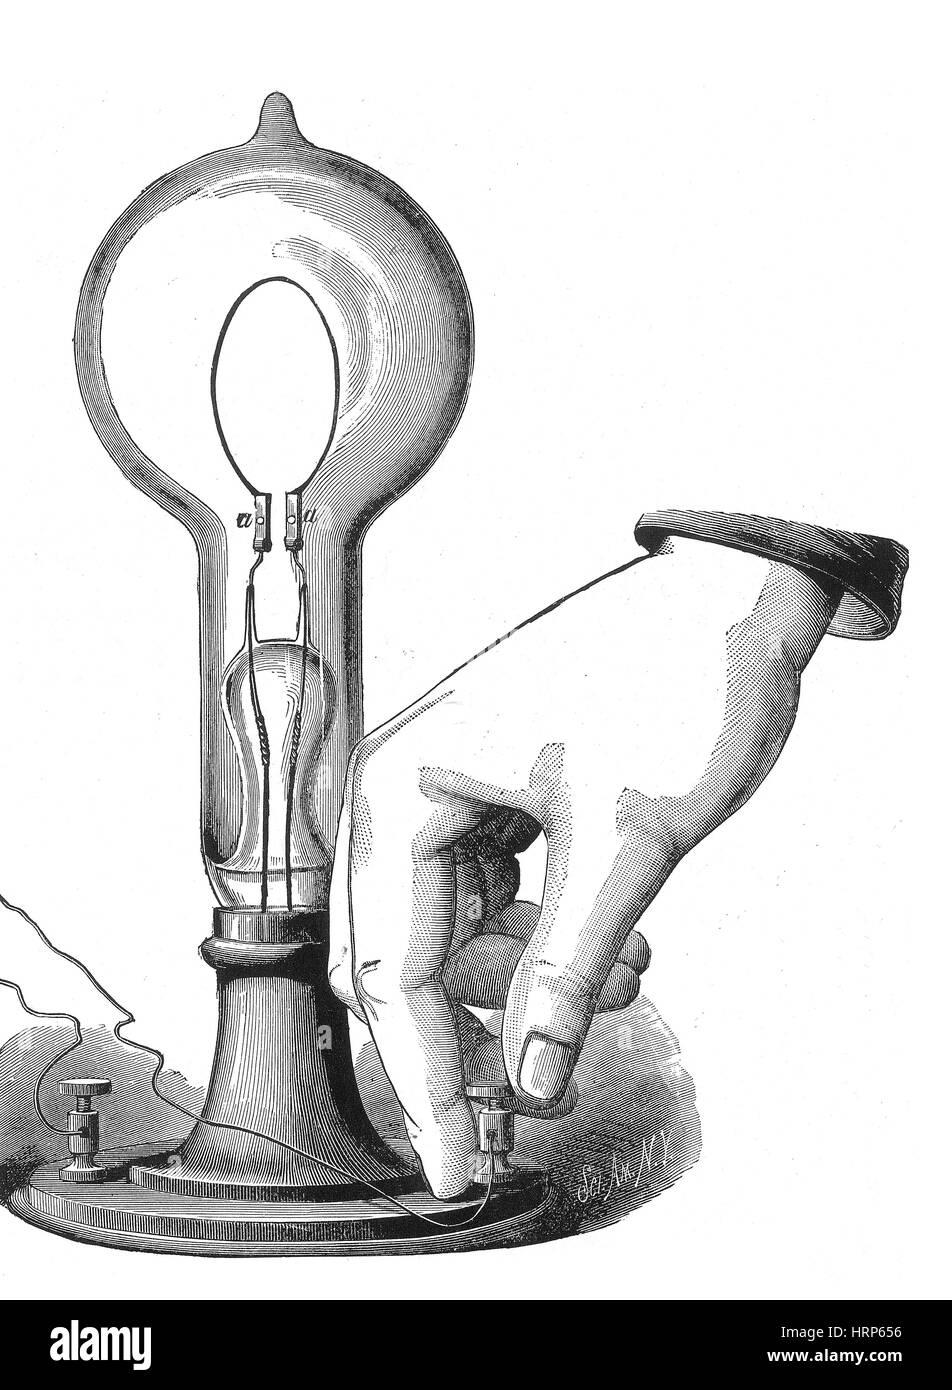 Lampadina A Incandescenza Storia thomas edison, lampada ad incandescenza, 1880 foto